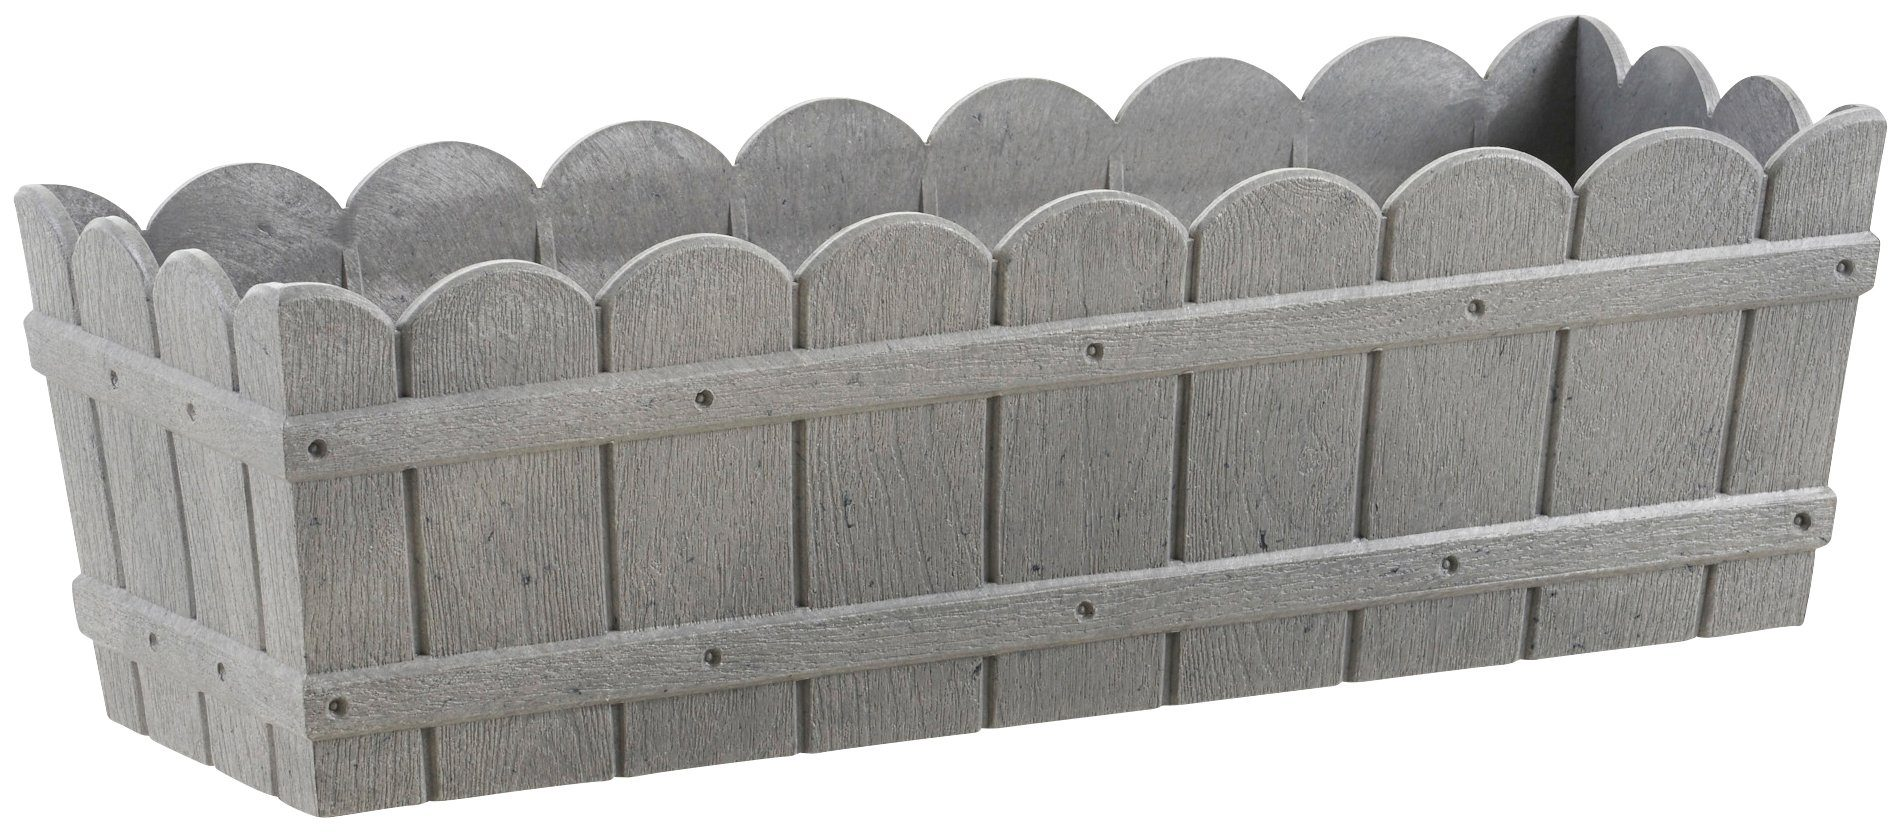 emsa blumenkasten country bxtxh 50x17 5x15 5 cm grau. Black Bedroom Furniture Sets. Home Design Ideas